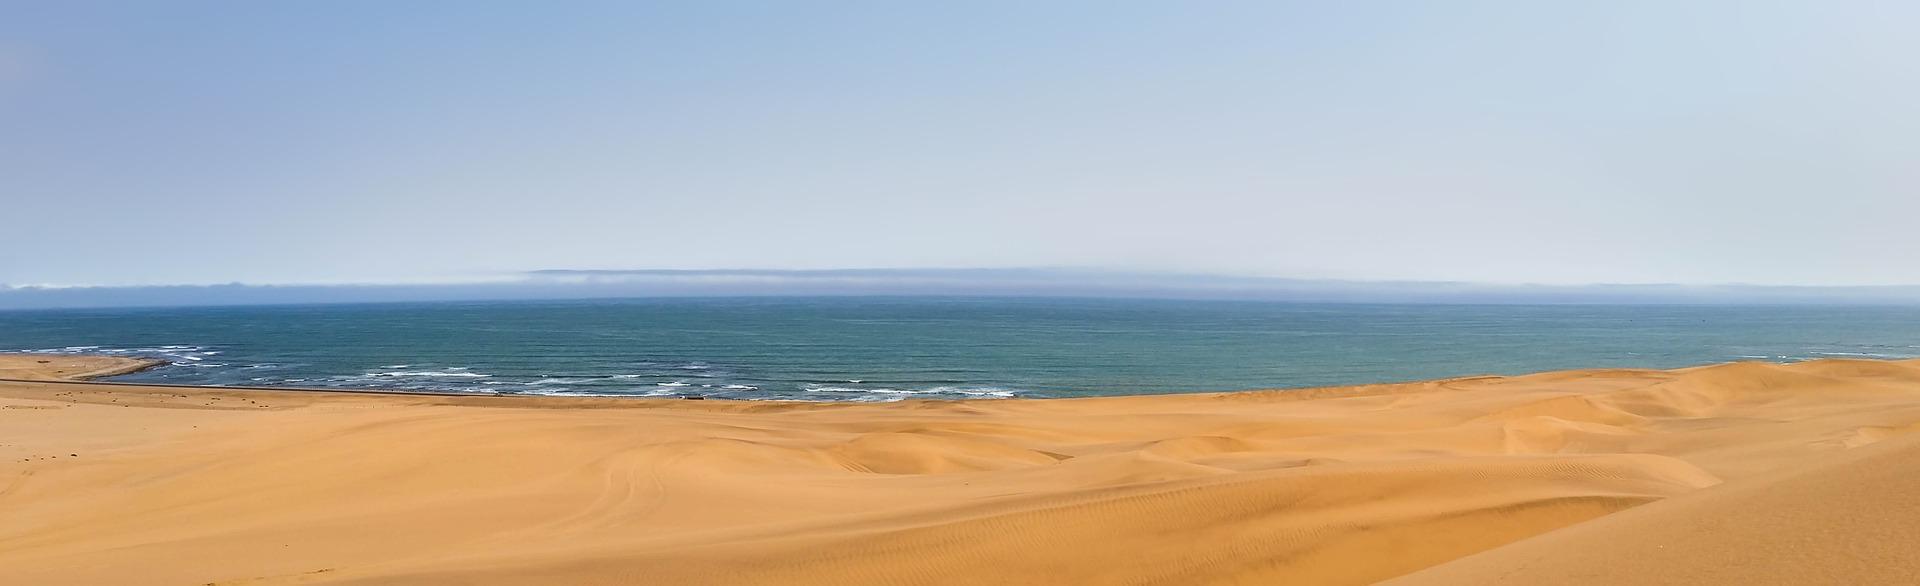 Namibia Strand Atlantikküste Meer